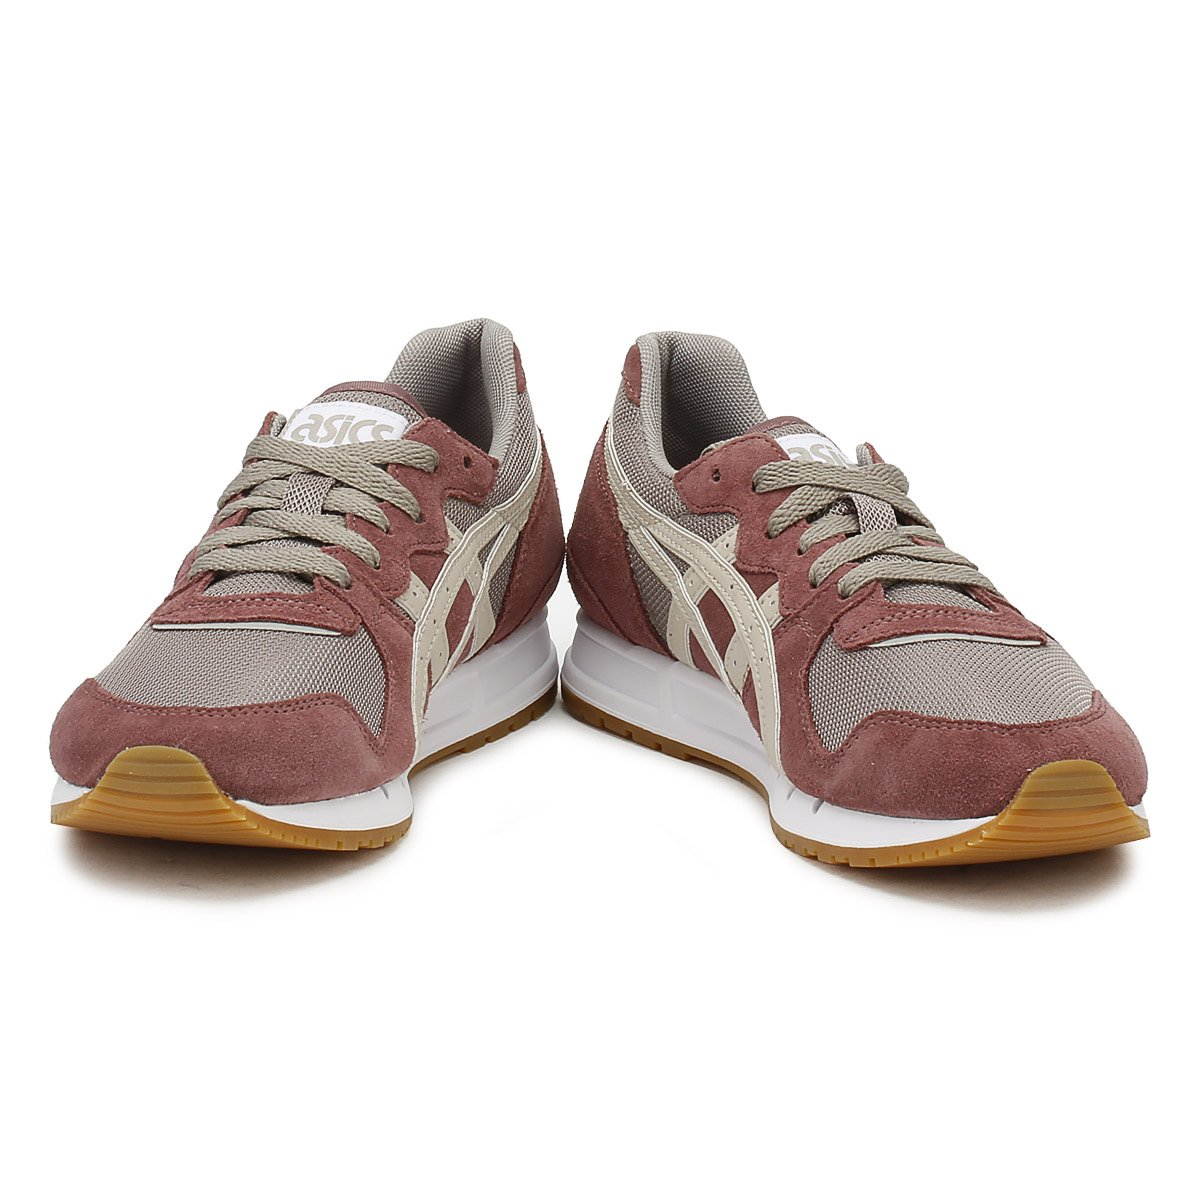 Tiger Grau Handtaschen Damen Sneaker Asics 38Schuheamp; 9IWDHE2eY